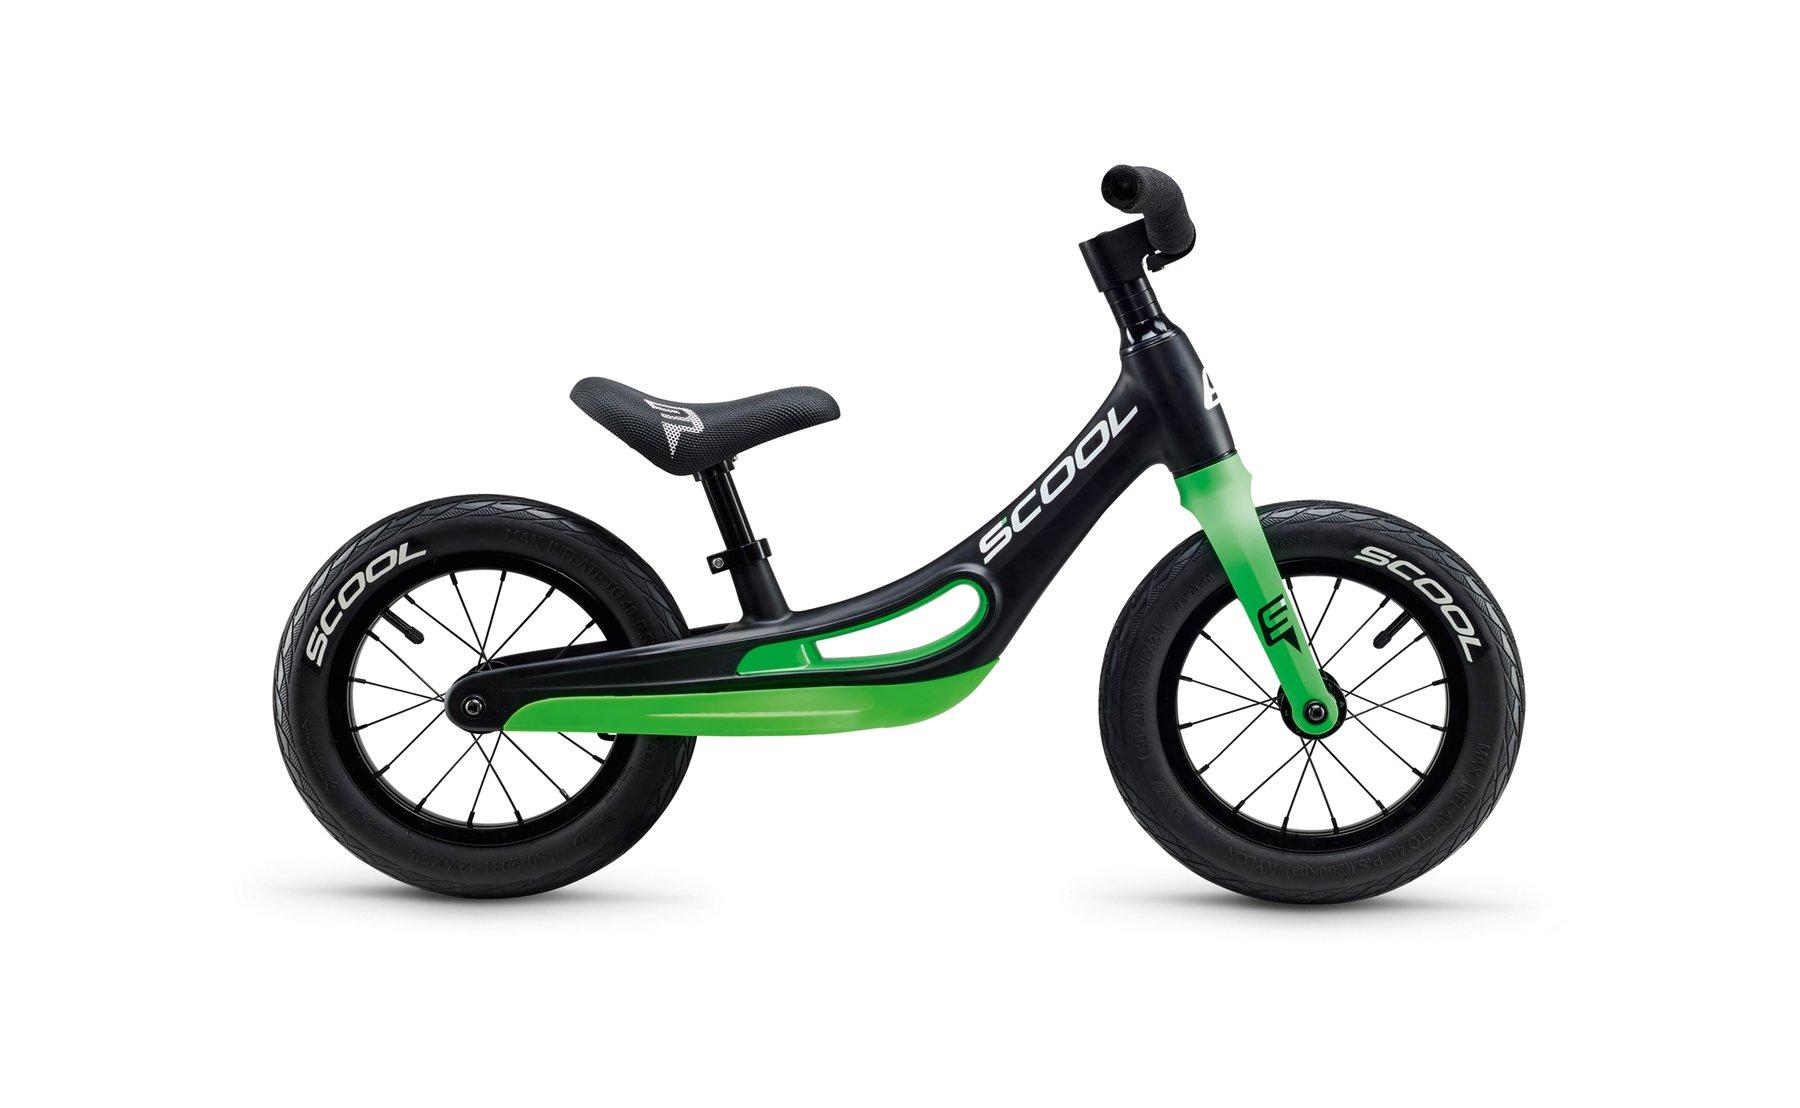 S'COOL - Løbecykel - PedeX Magnesium 12'' - Grøn | løbecykel og løbehjul